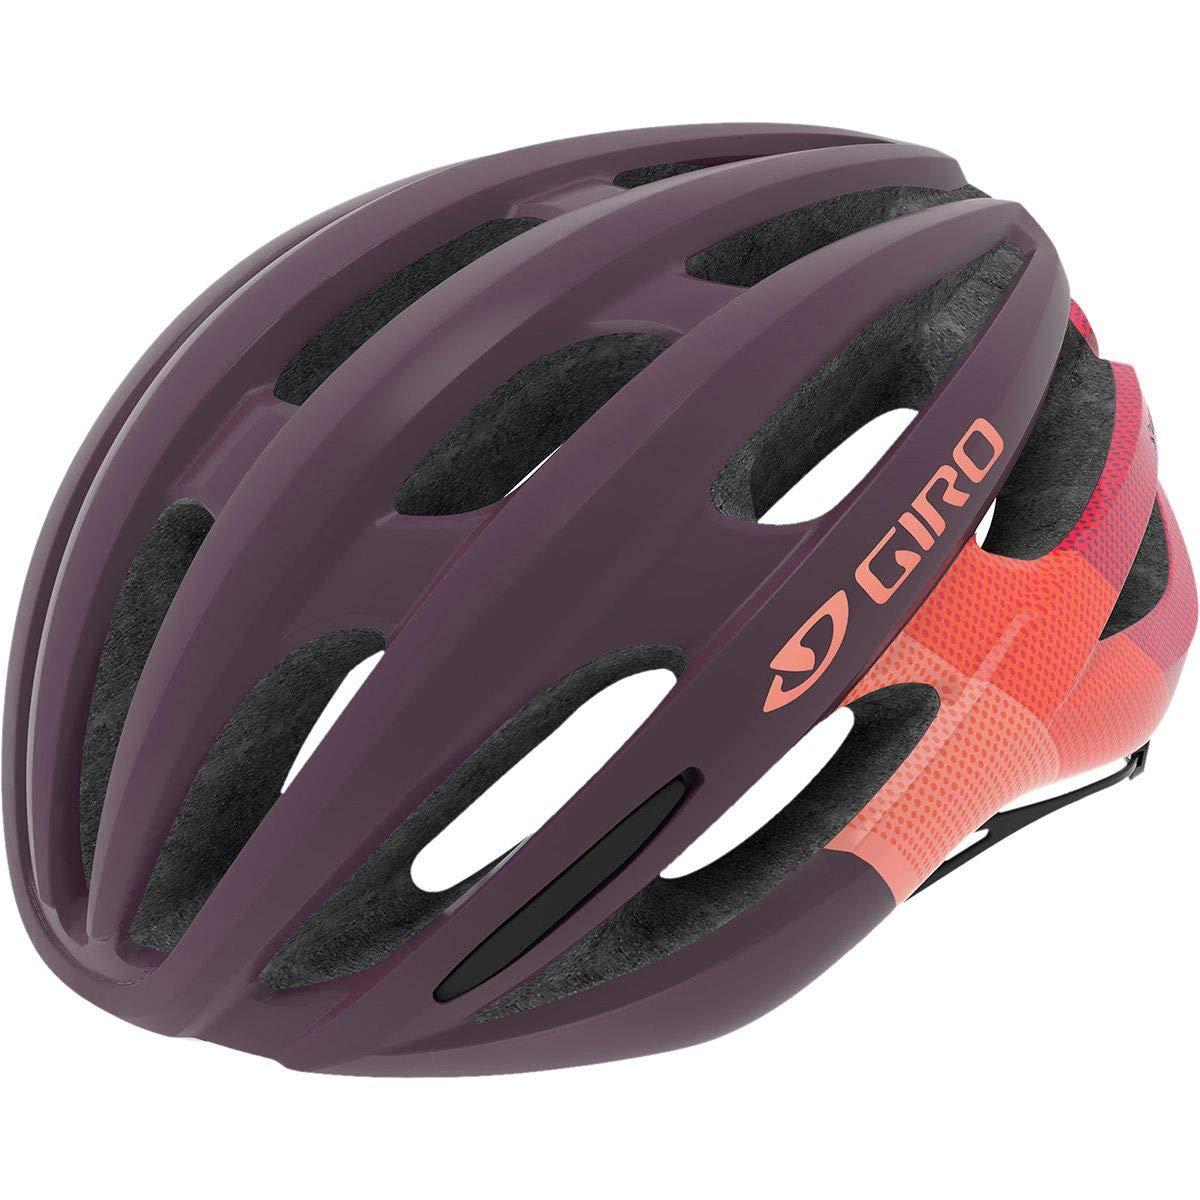 Giro Saga Cycling Helmet - Women's Matte Dusty Purple Bars Small